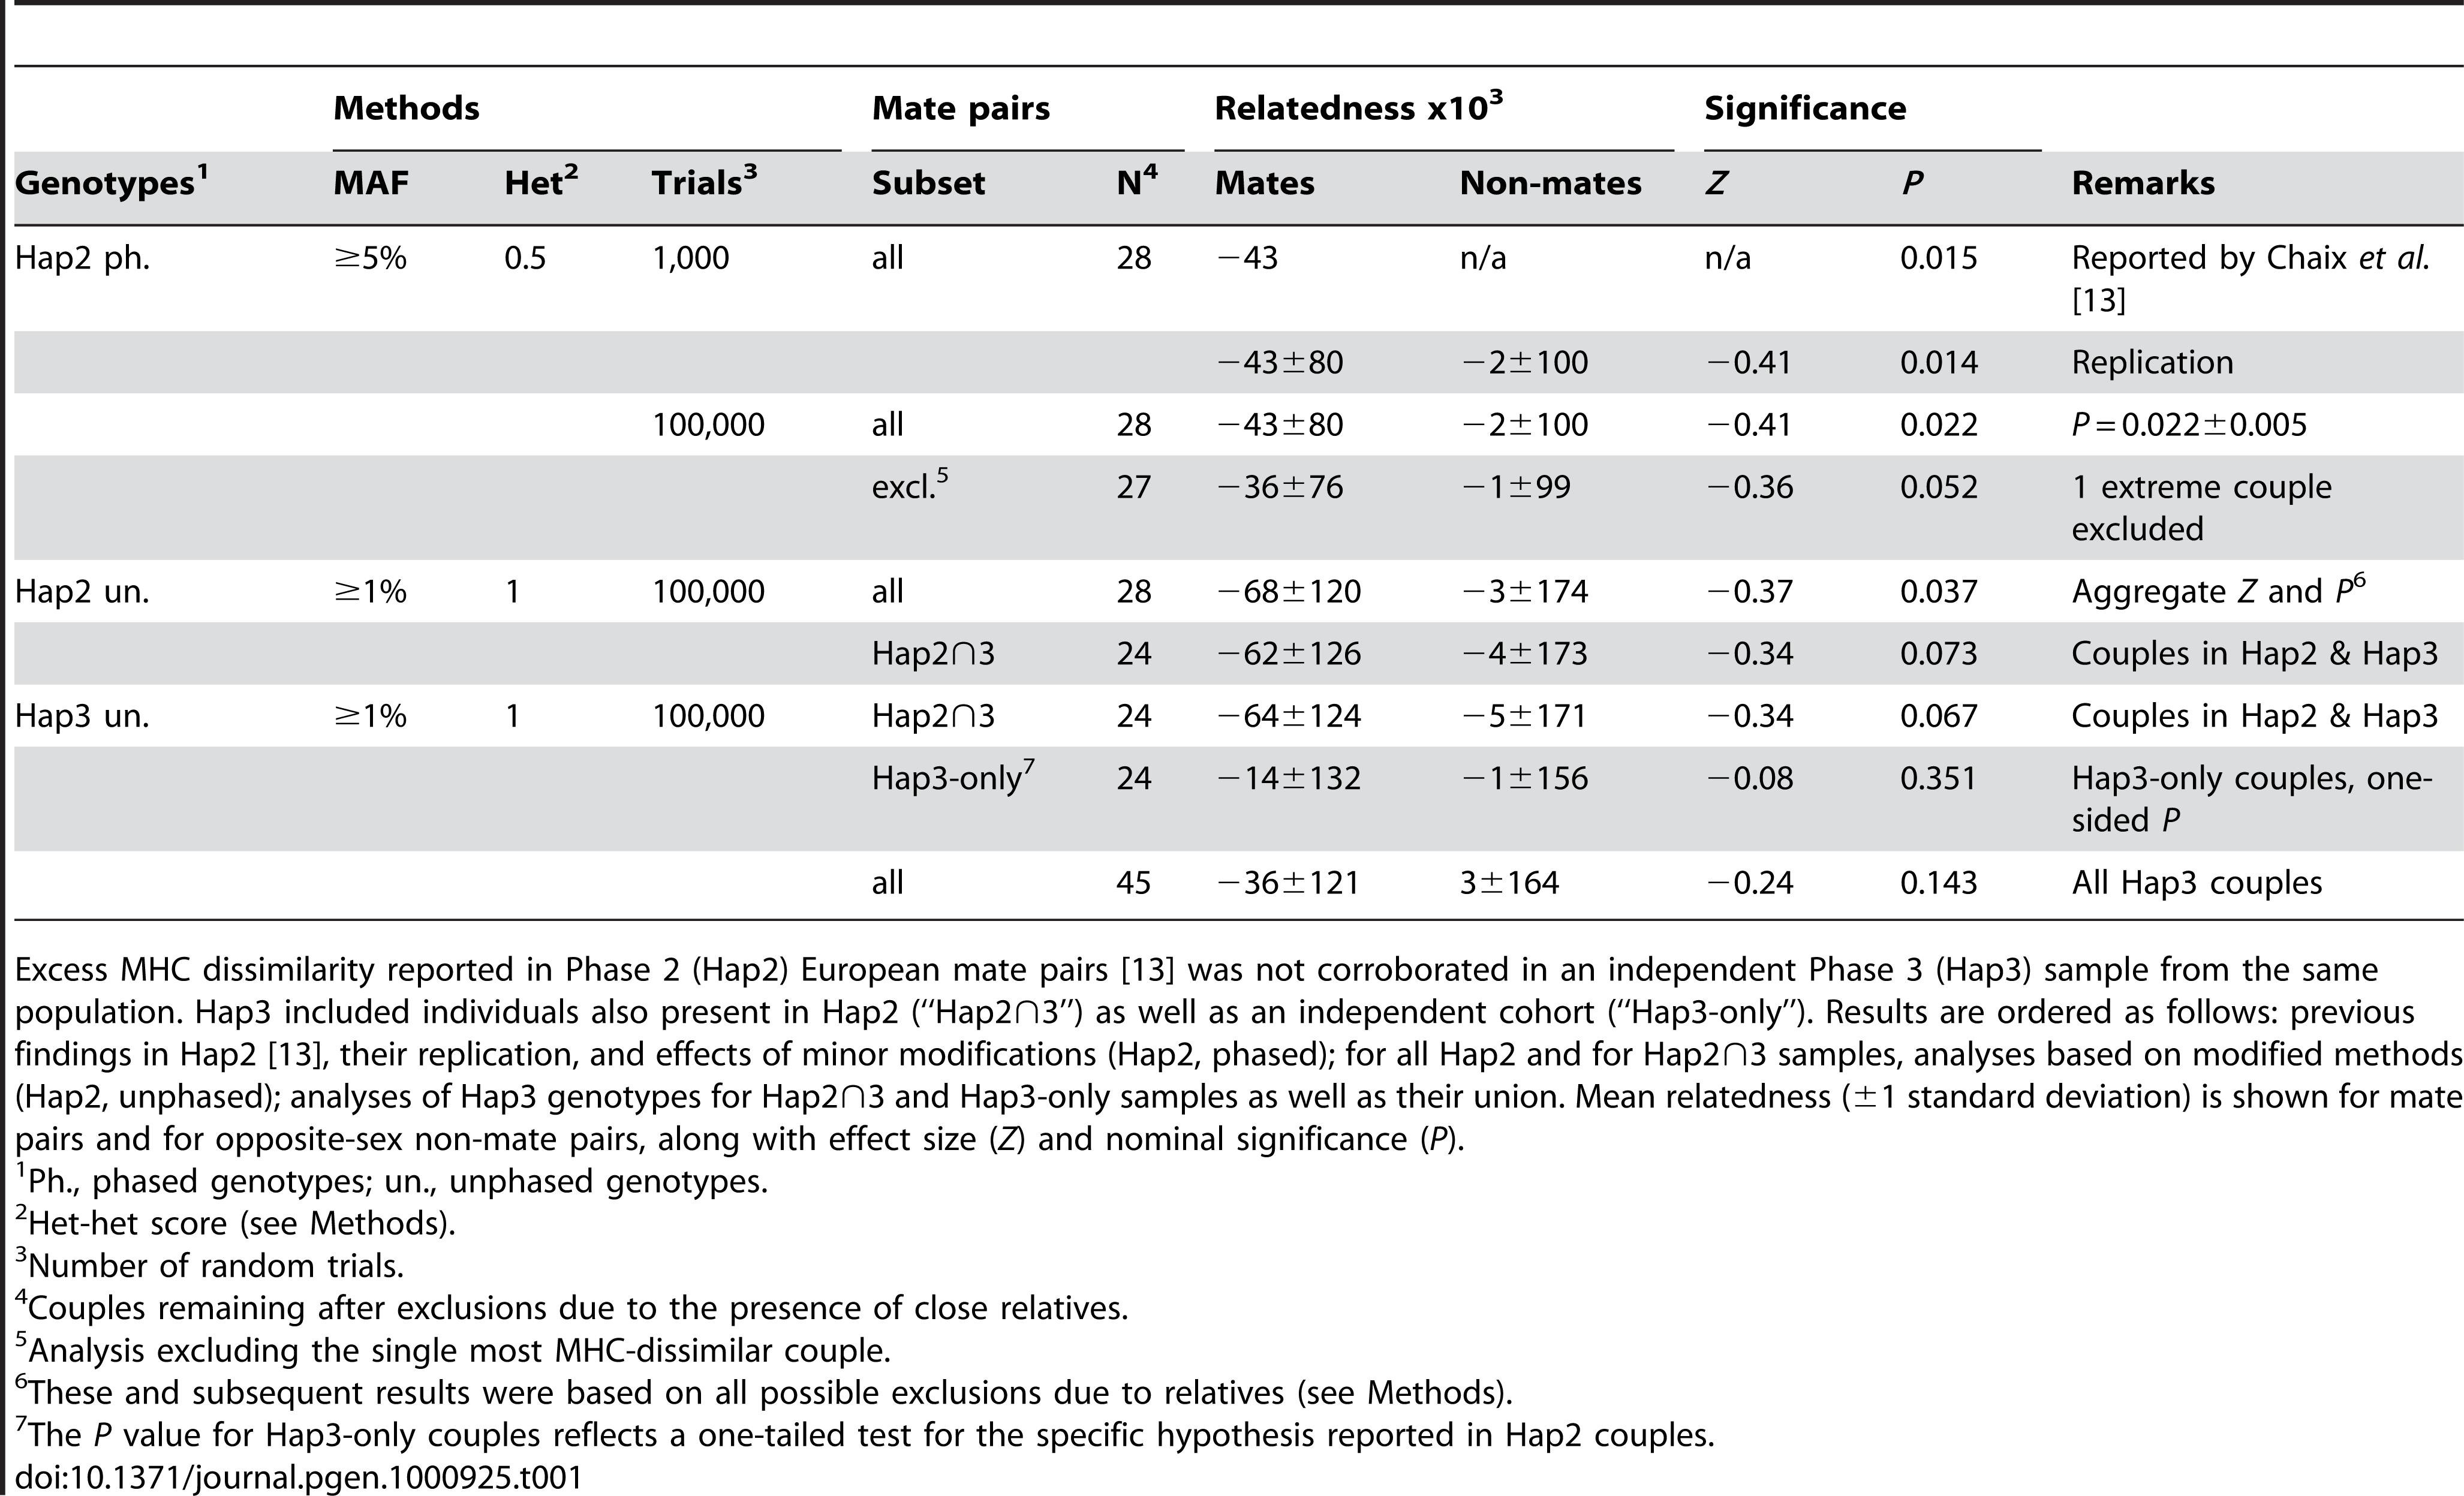 Summary of MHC relatedness analyses in HapMap Europeans.